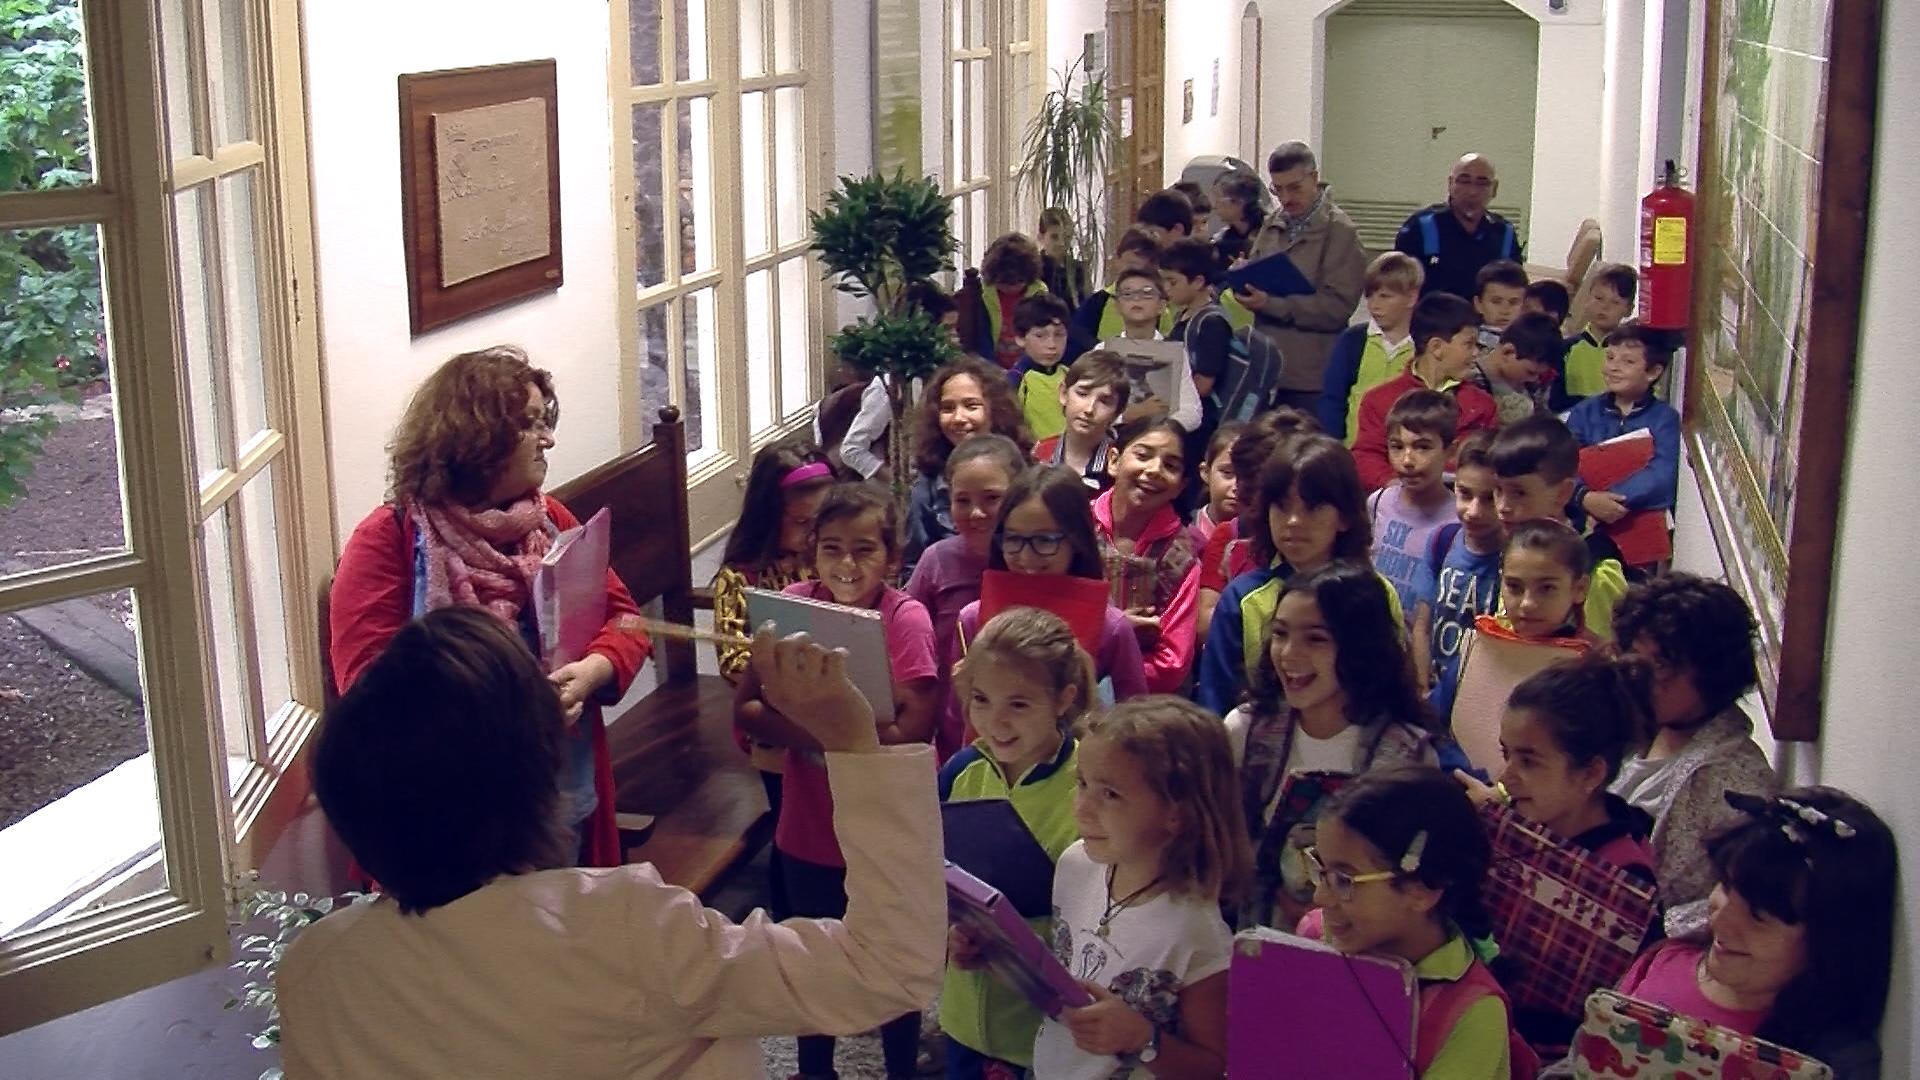 Visita alumnes Ajuntament.00_00_09_11.Imagen fija003